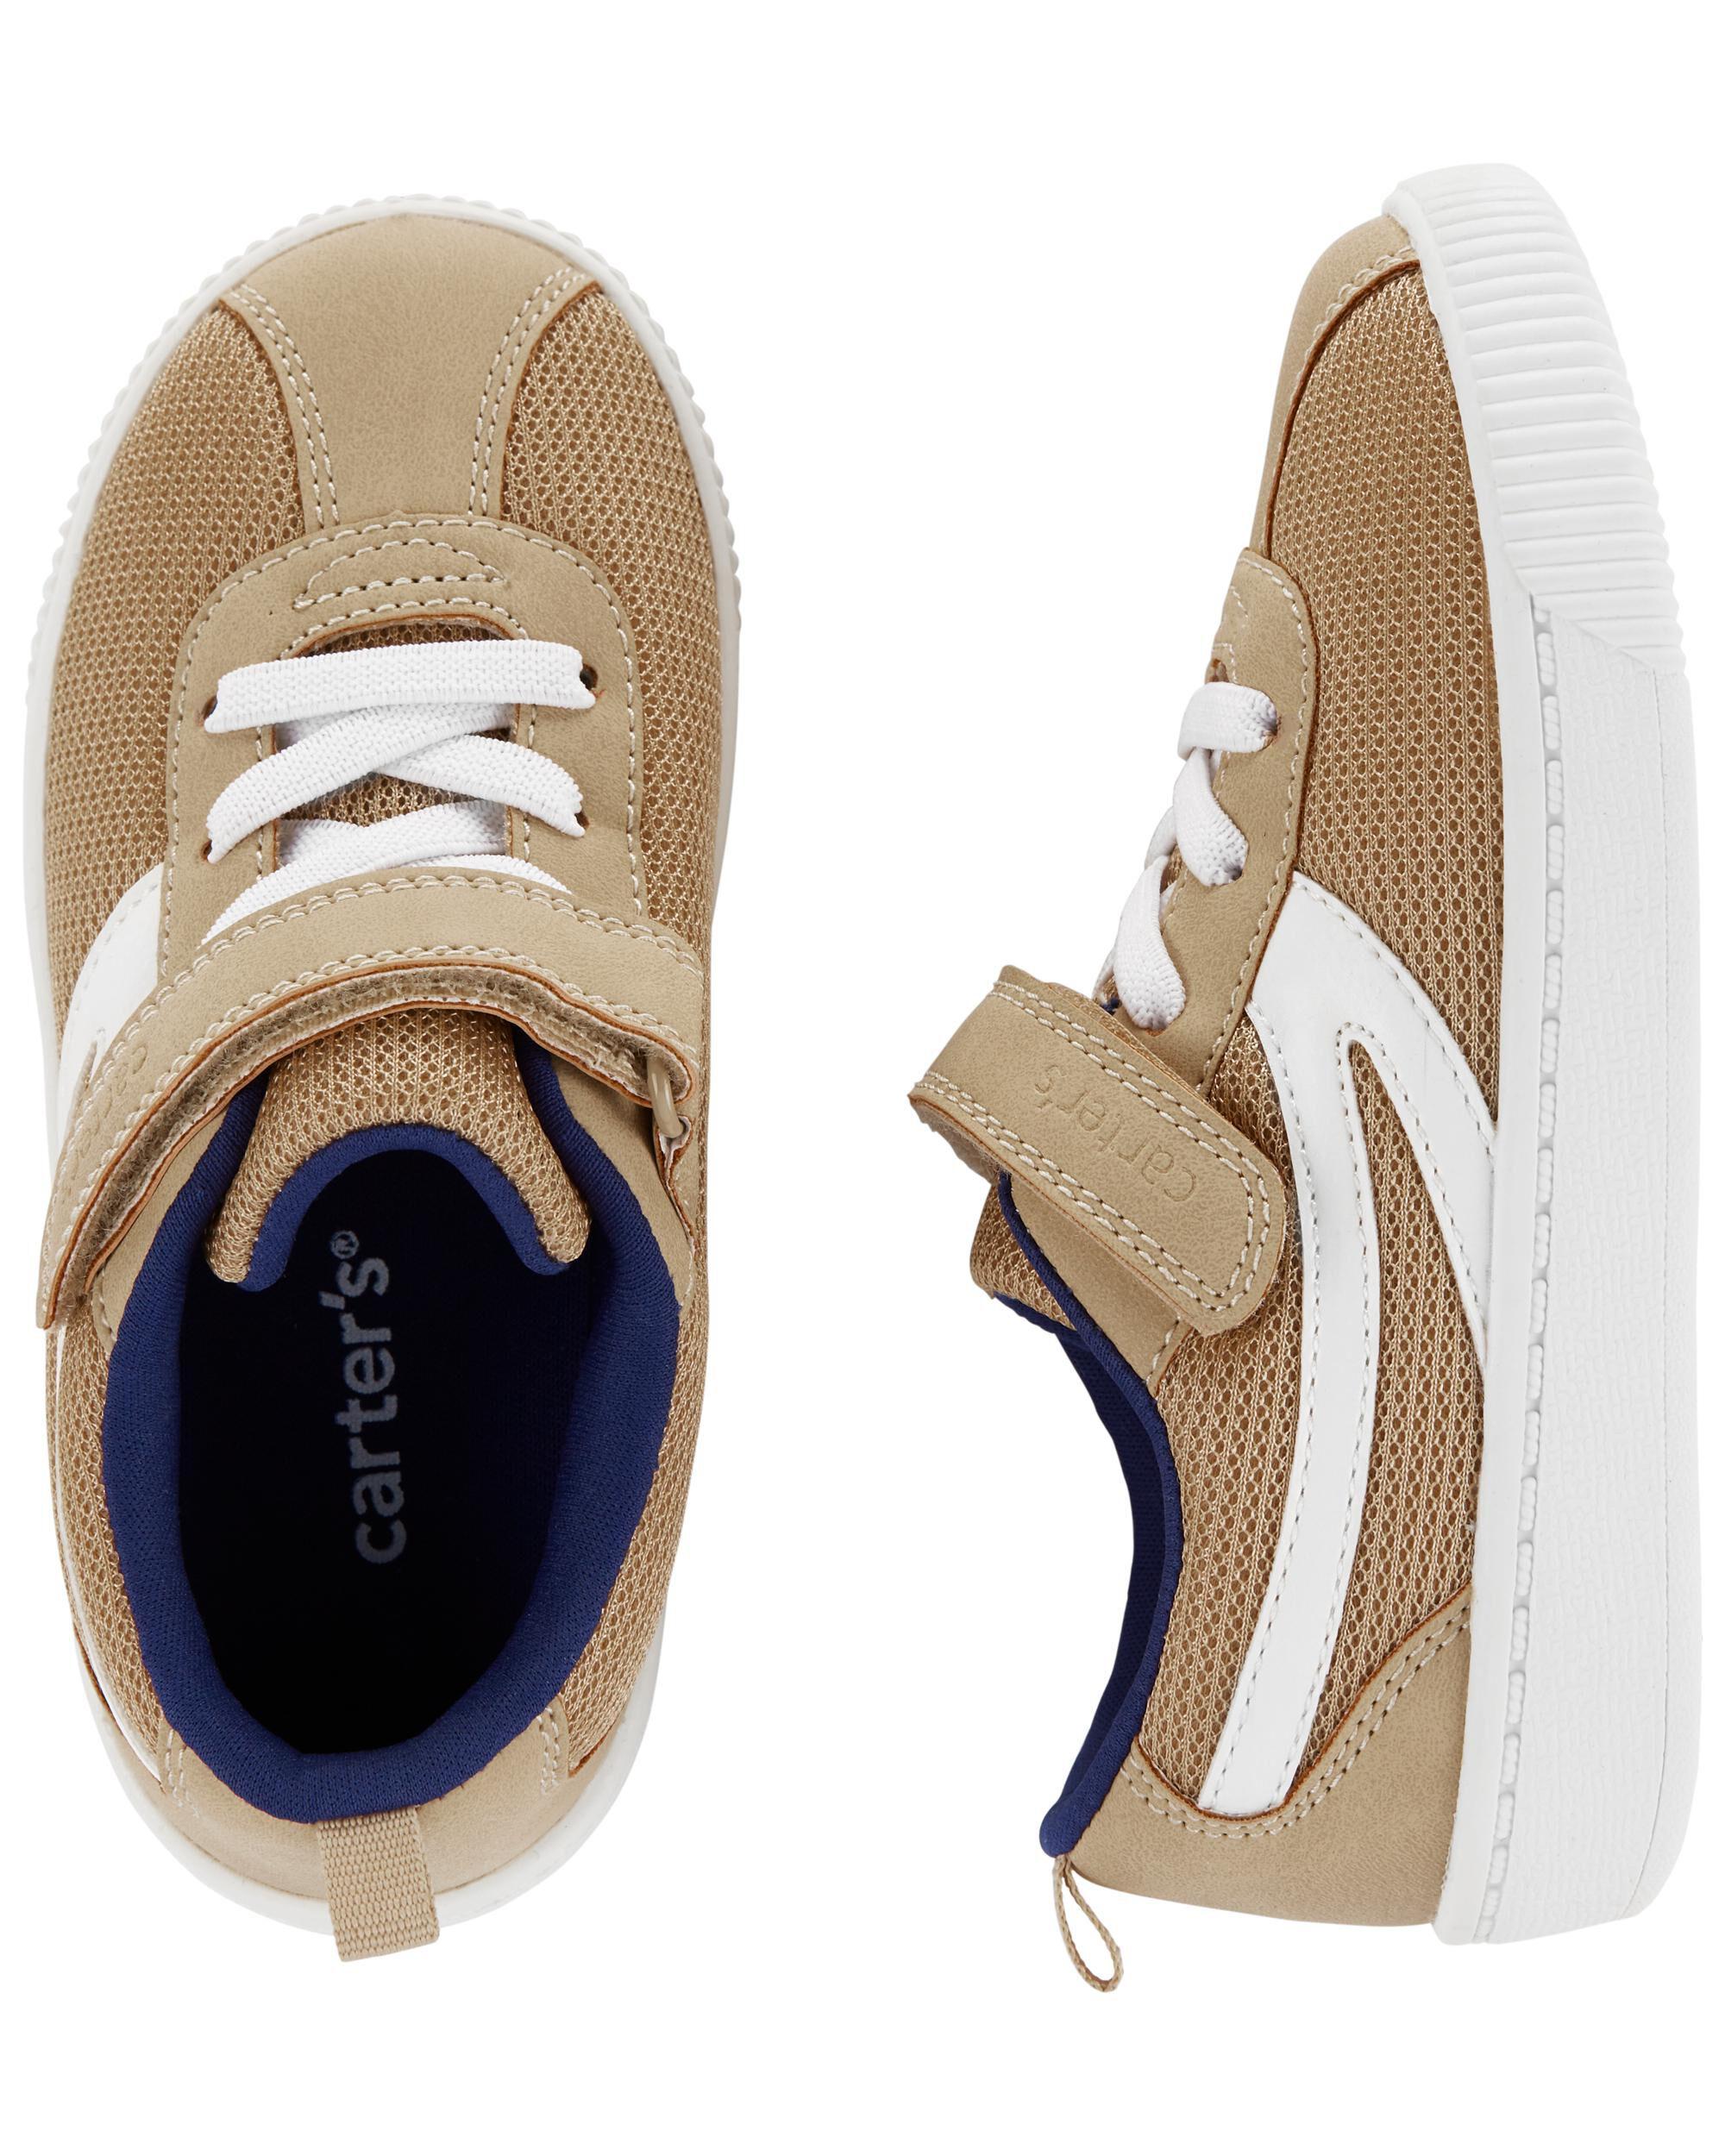 Carters Williams Sneakers